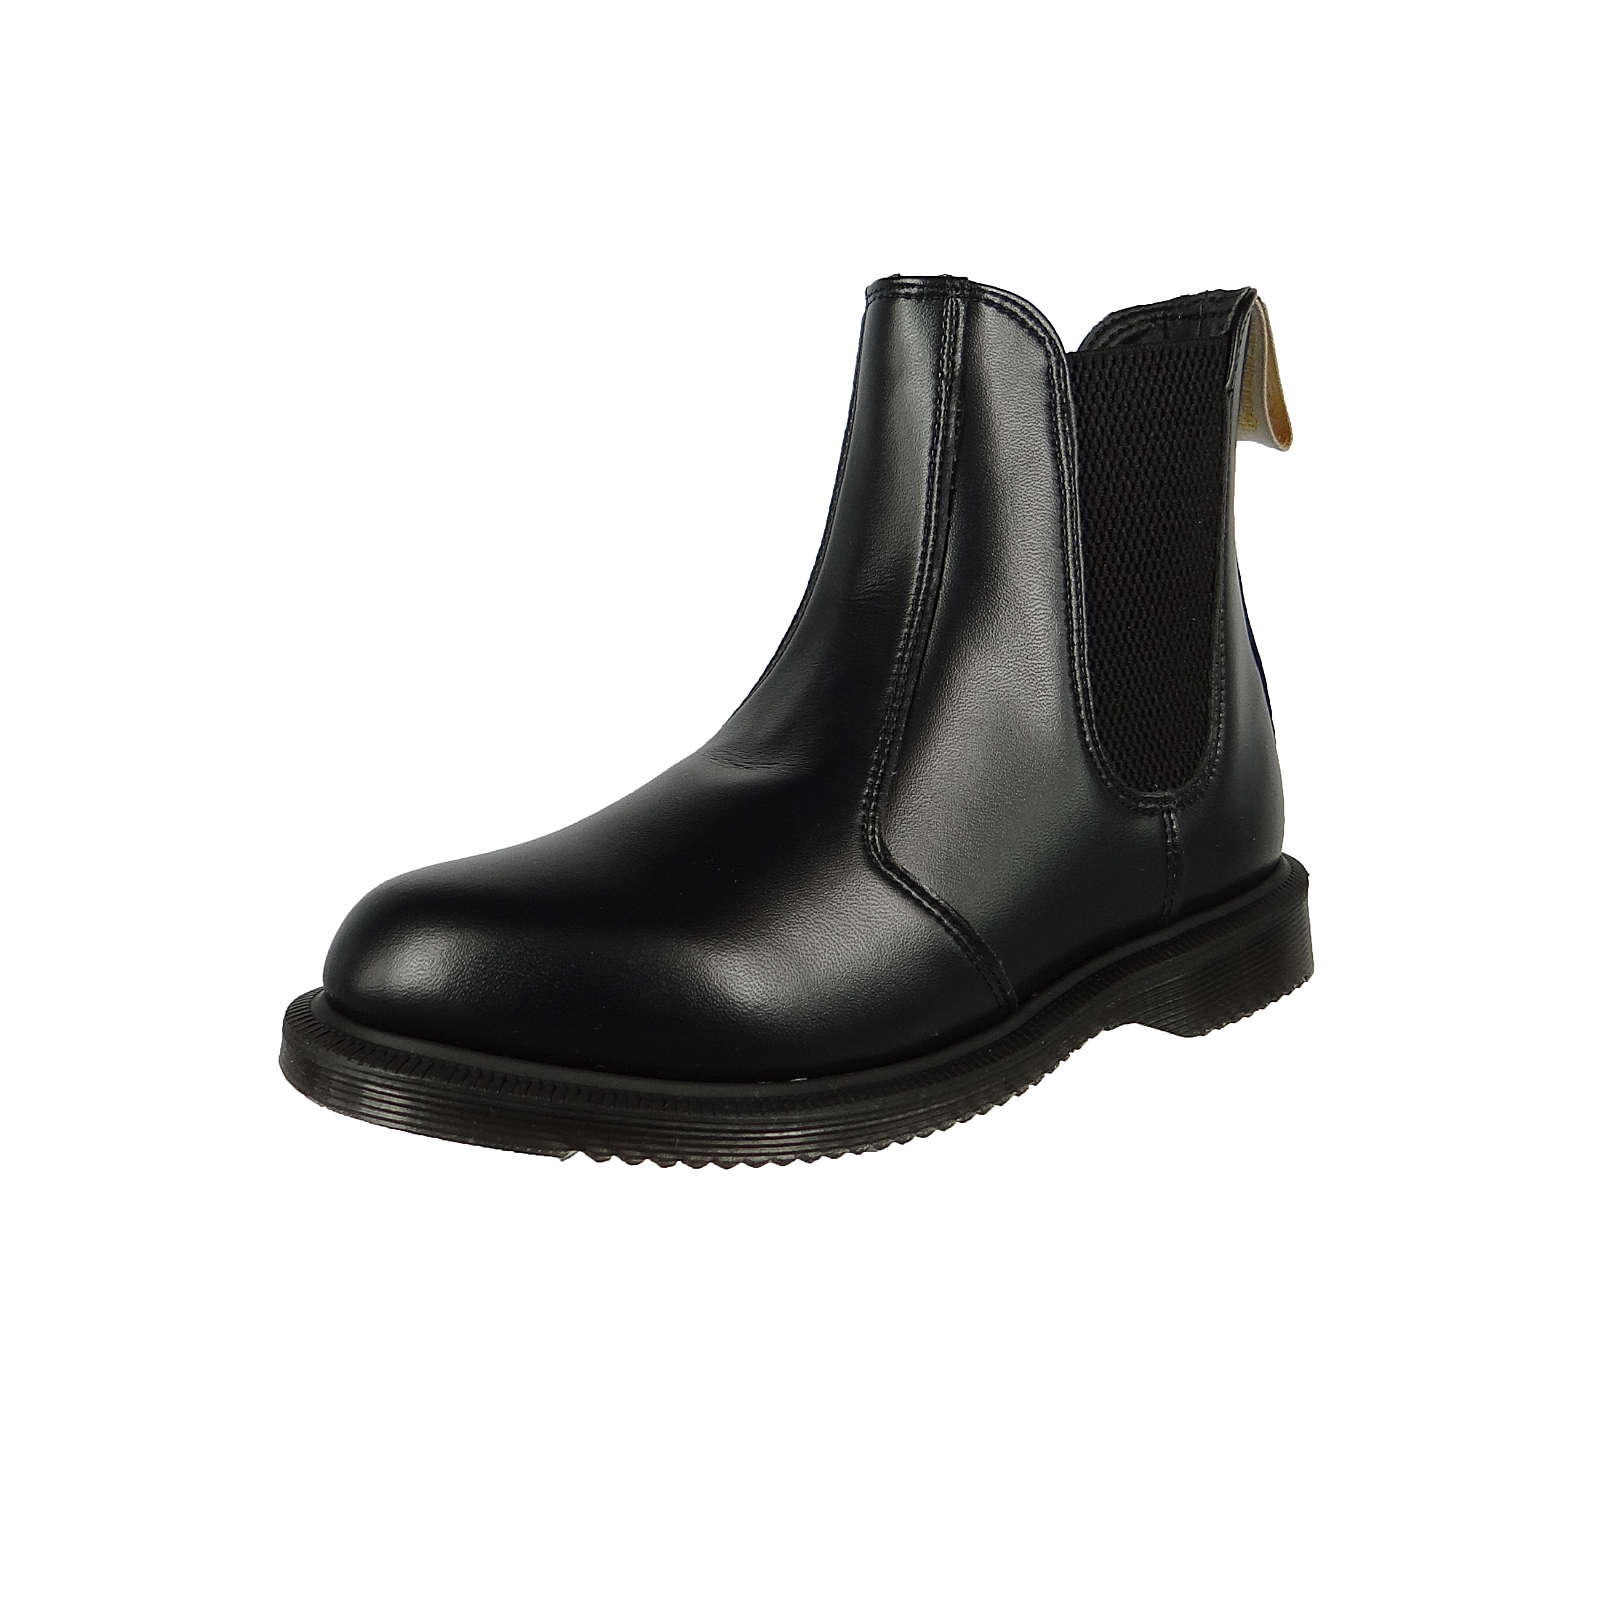 Dr. Martens Vegan Flora 24179001 Damen Black Felix Rub Off Schwarz Chelsea Boot Klassische Stiefeletten schwarz Damen Gr. 38